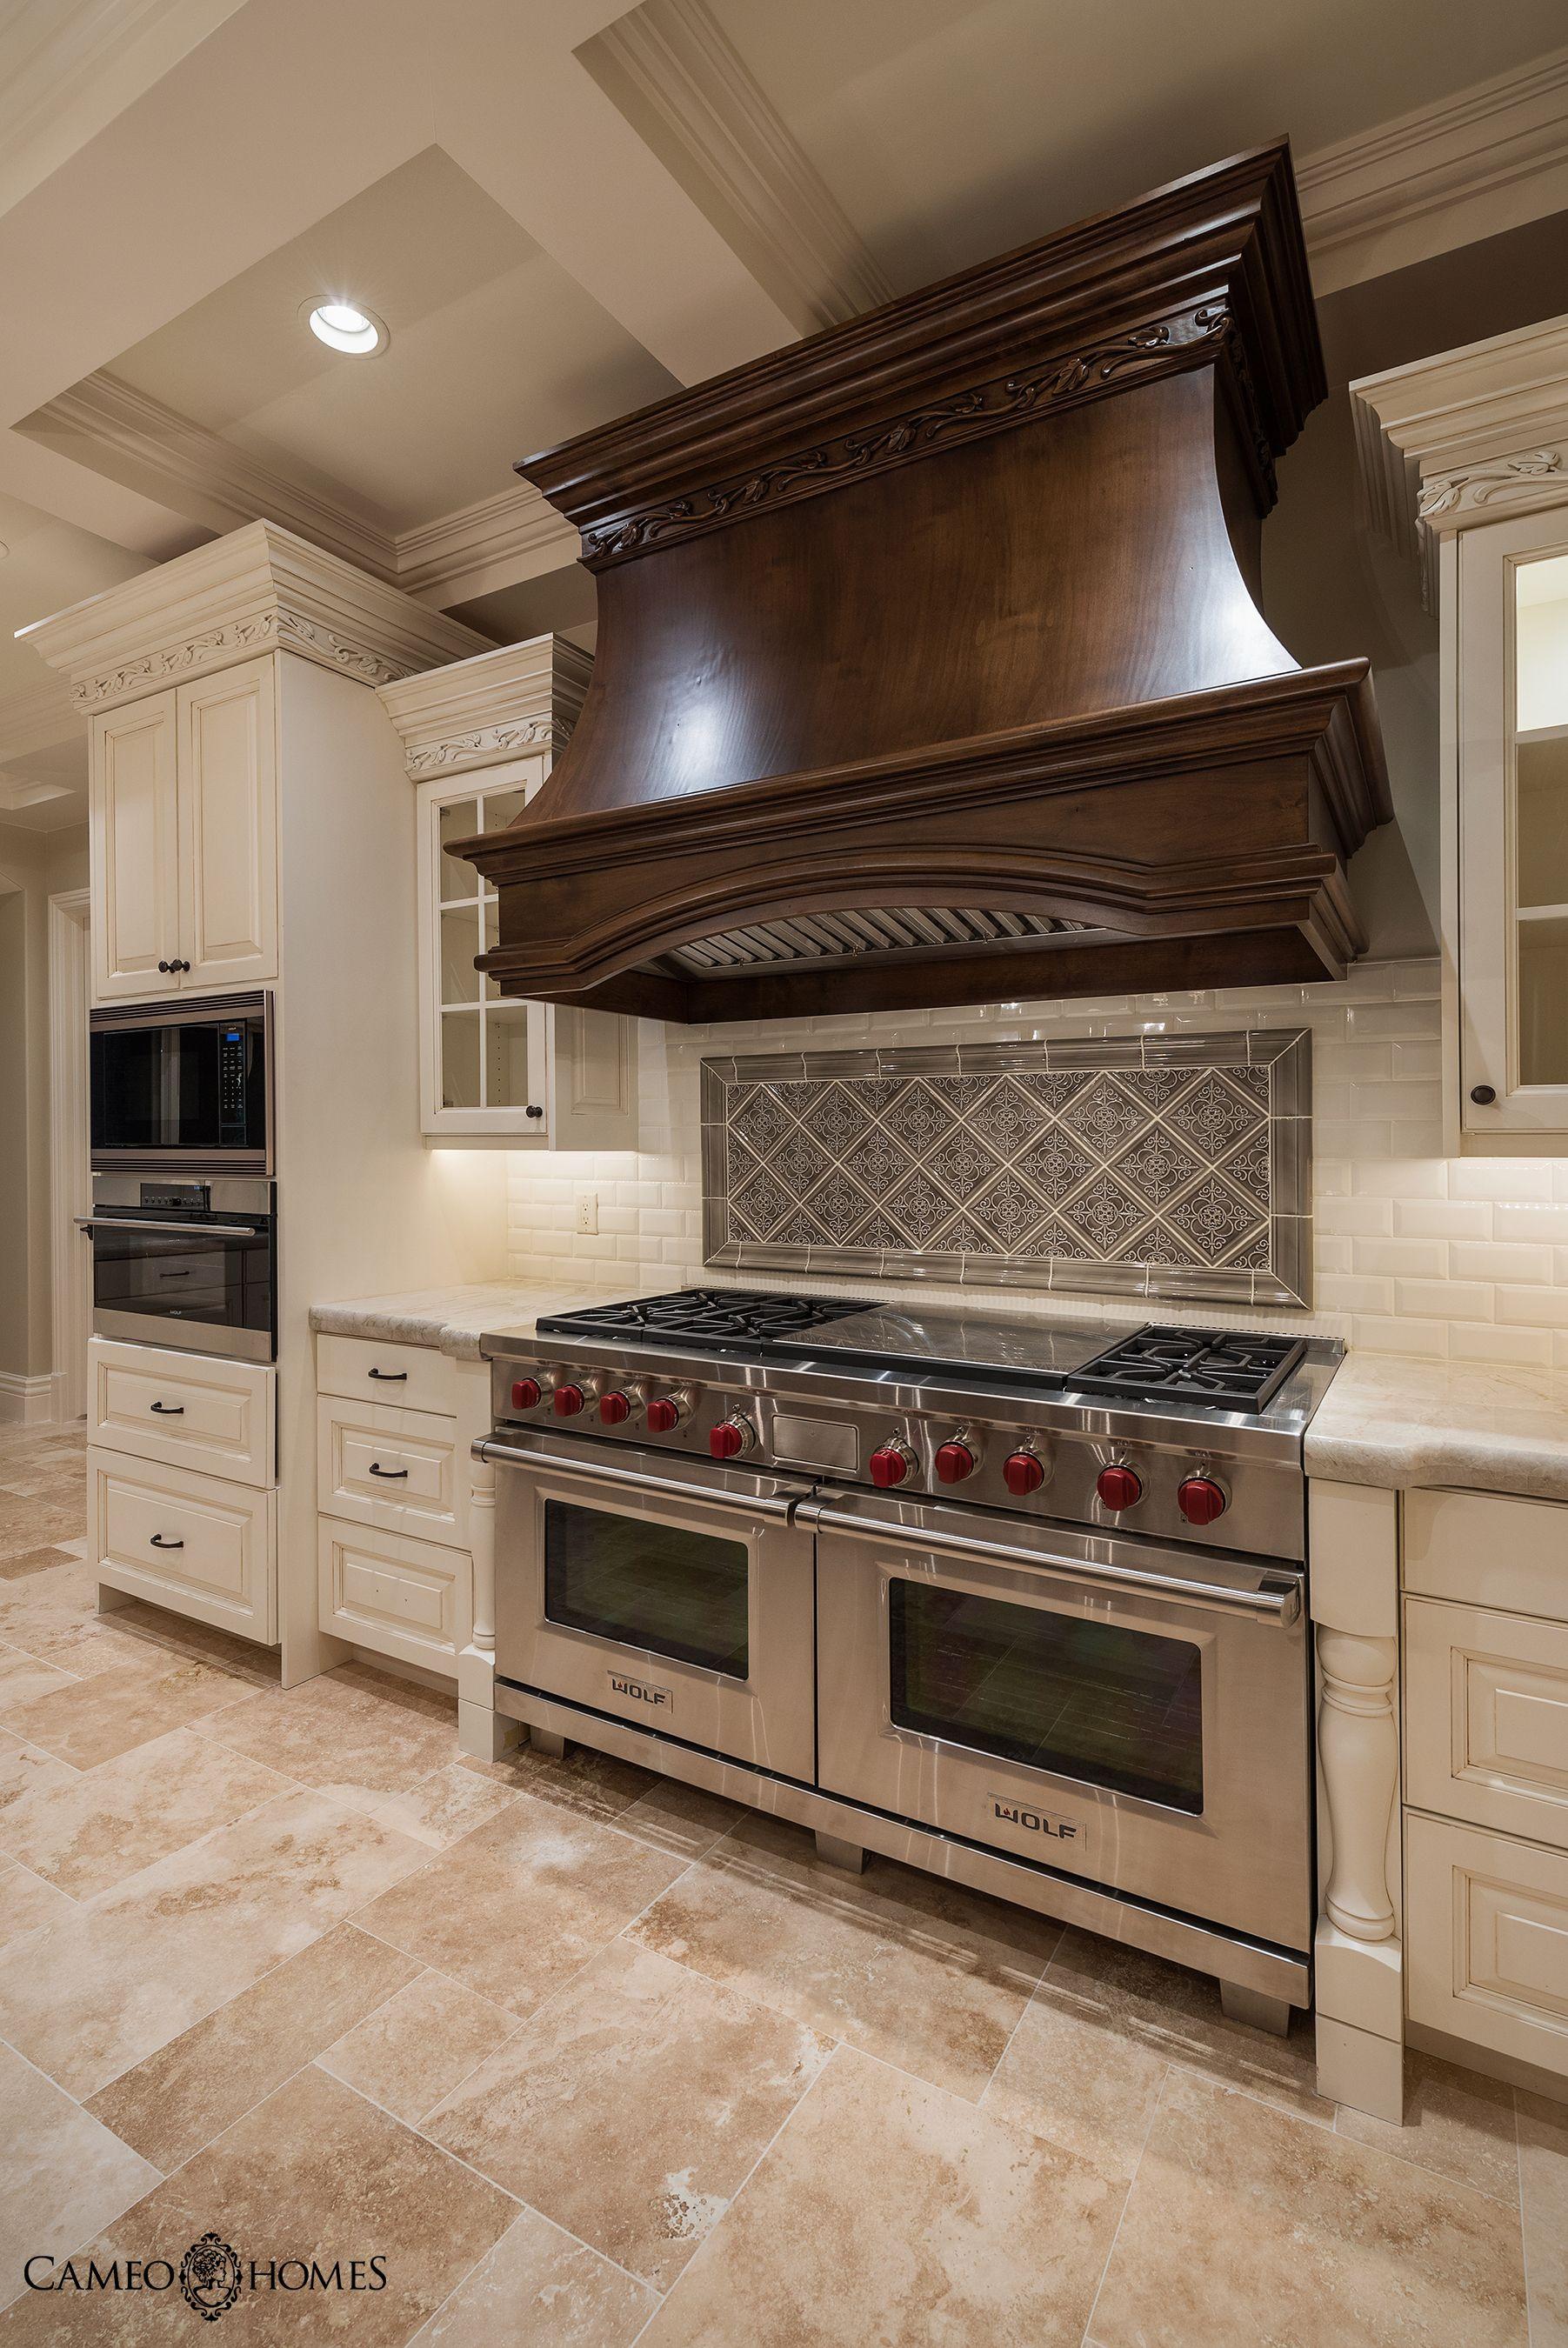 sub zero wolf kitchen refacing cabinet doors beautiful #kitchen with sub-zero & appliances in utah ...